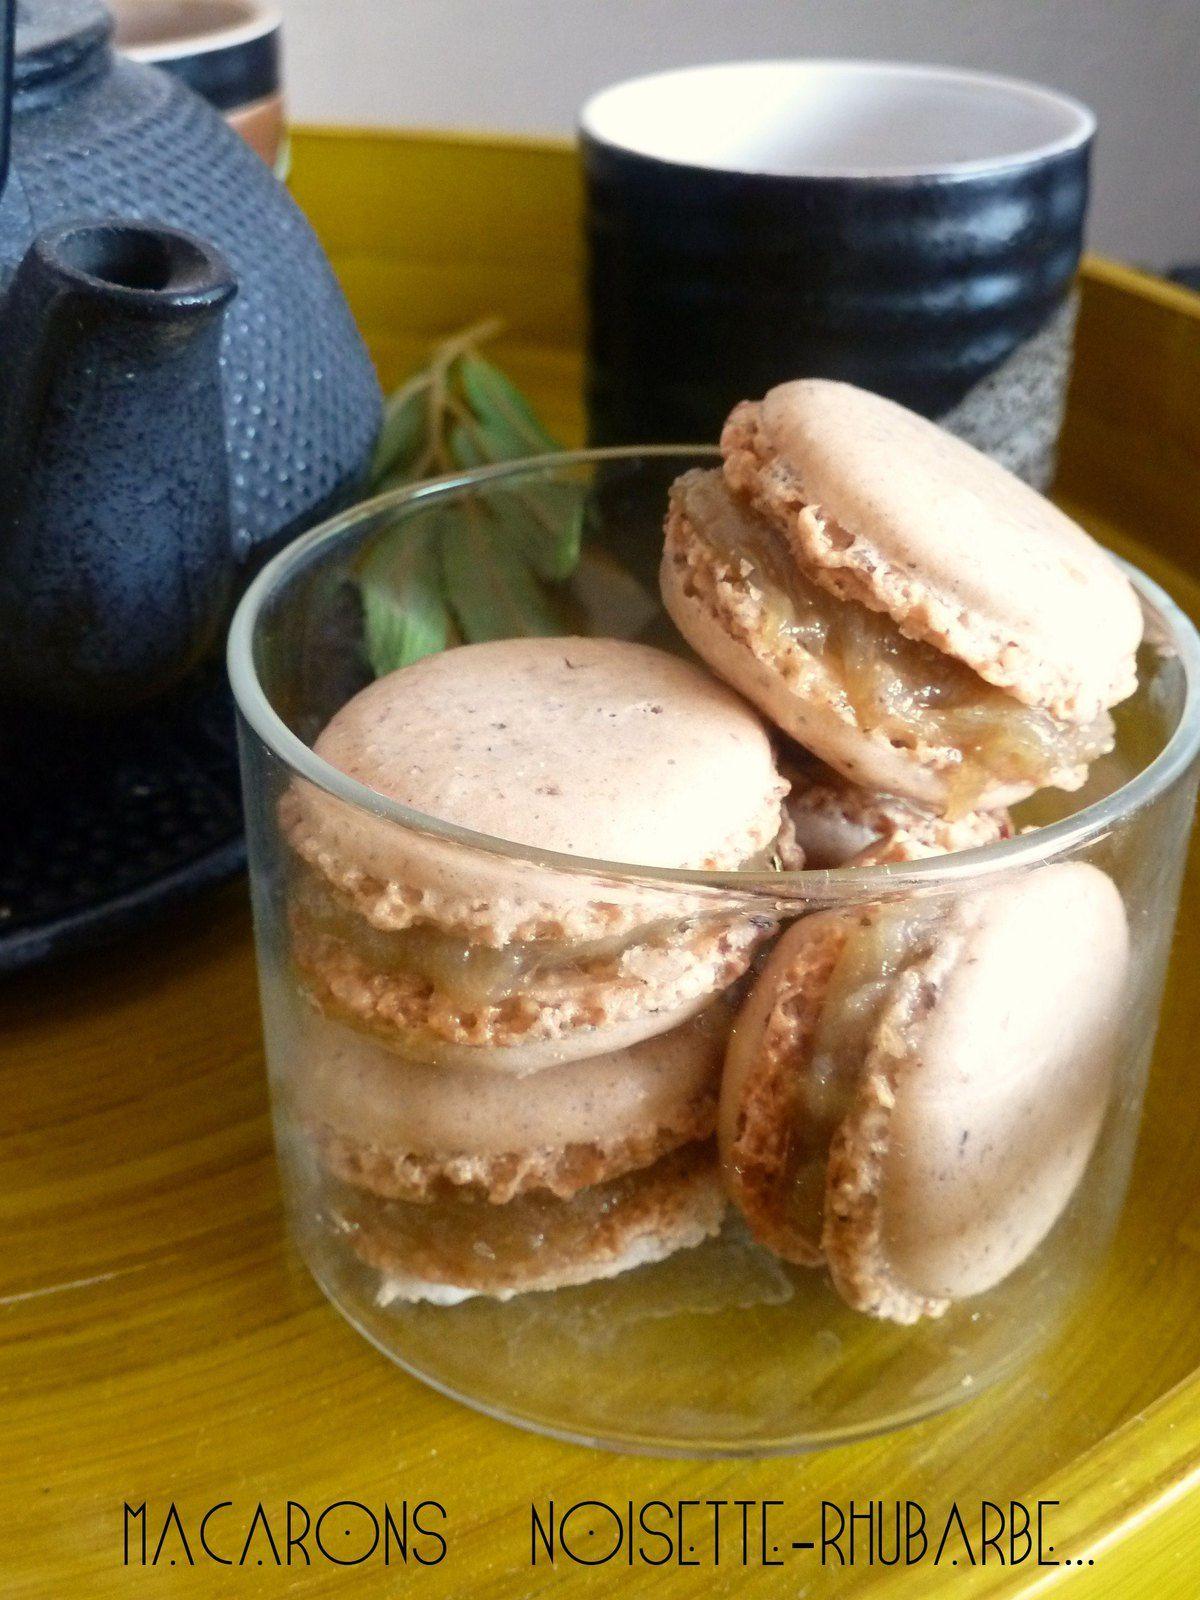 Macarons noisette à la rhubarbe